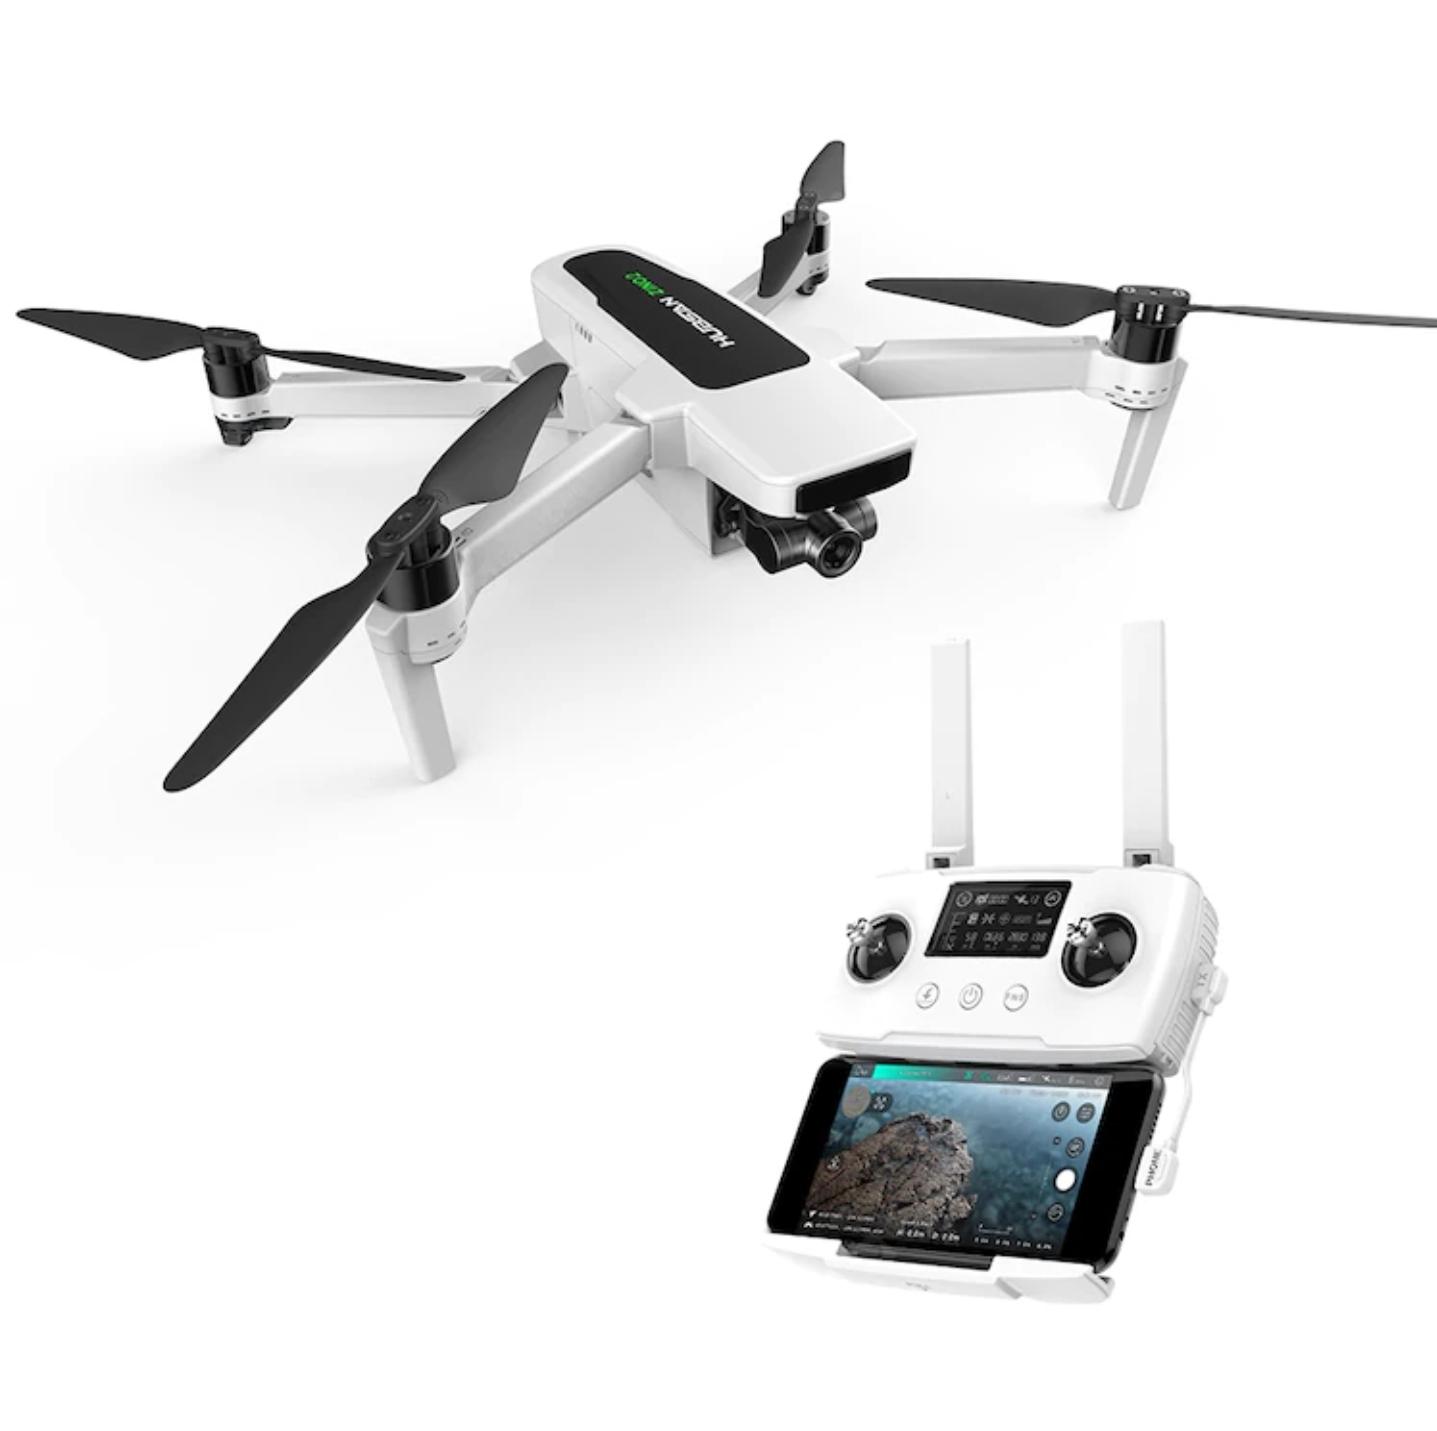 (Vorverkauf)(Gearbest) Hubsan Zino 2 GPS 4K-60fps Drohne/Quadcopter 3-Achsen Gimbal 33min Akkulaufzeit 1 Akku ohne Tasche